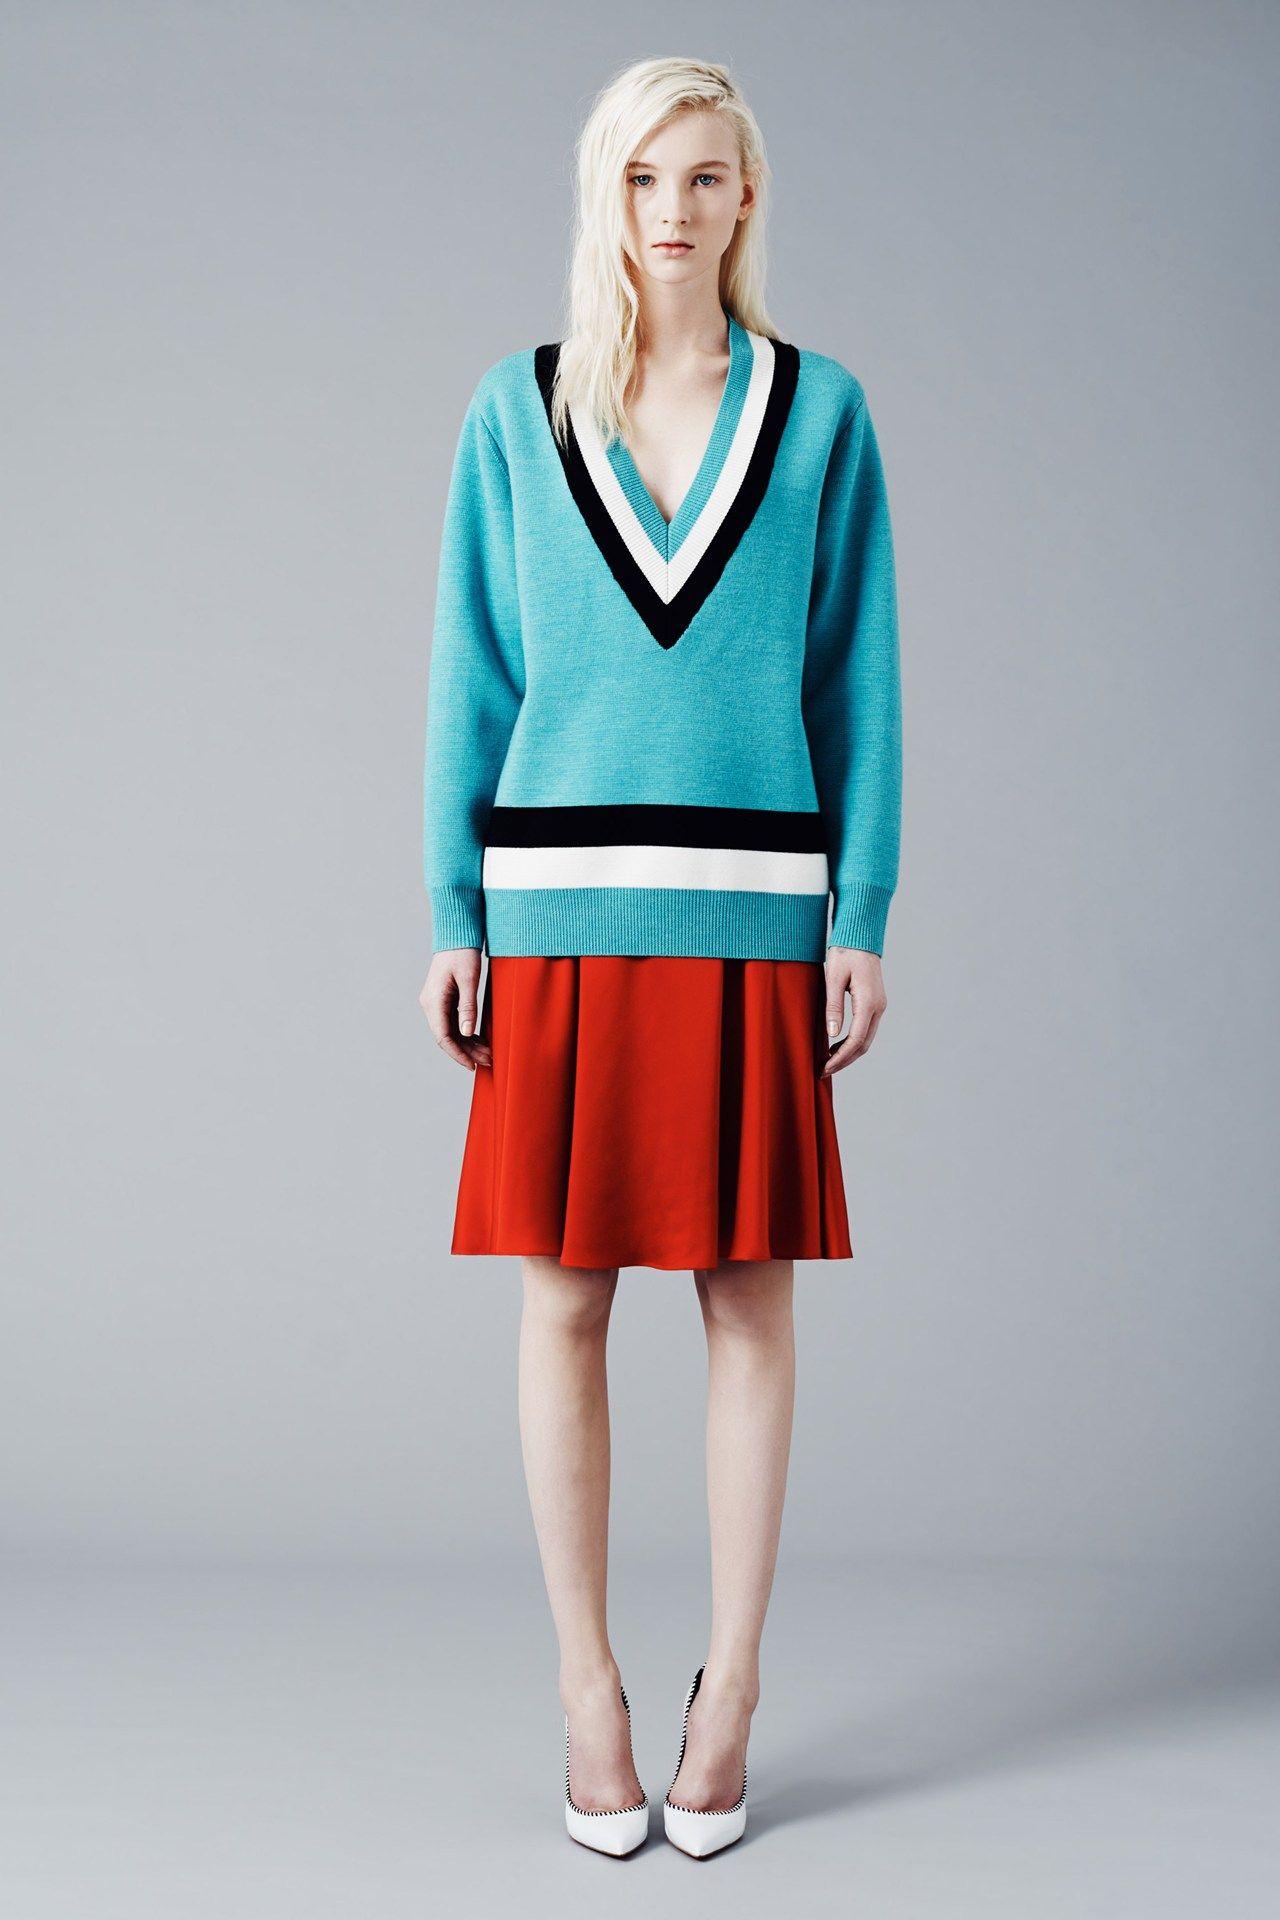 Jonathan Saunders fashion collection, pre-autumn/winter 2014